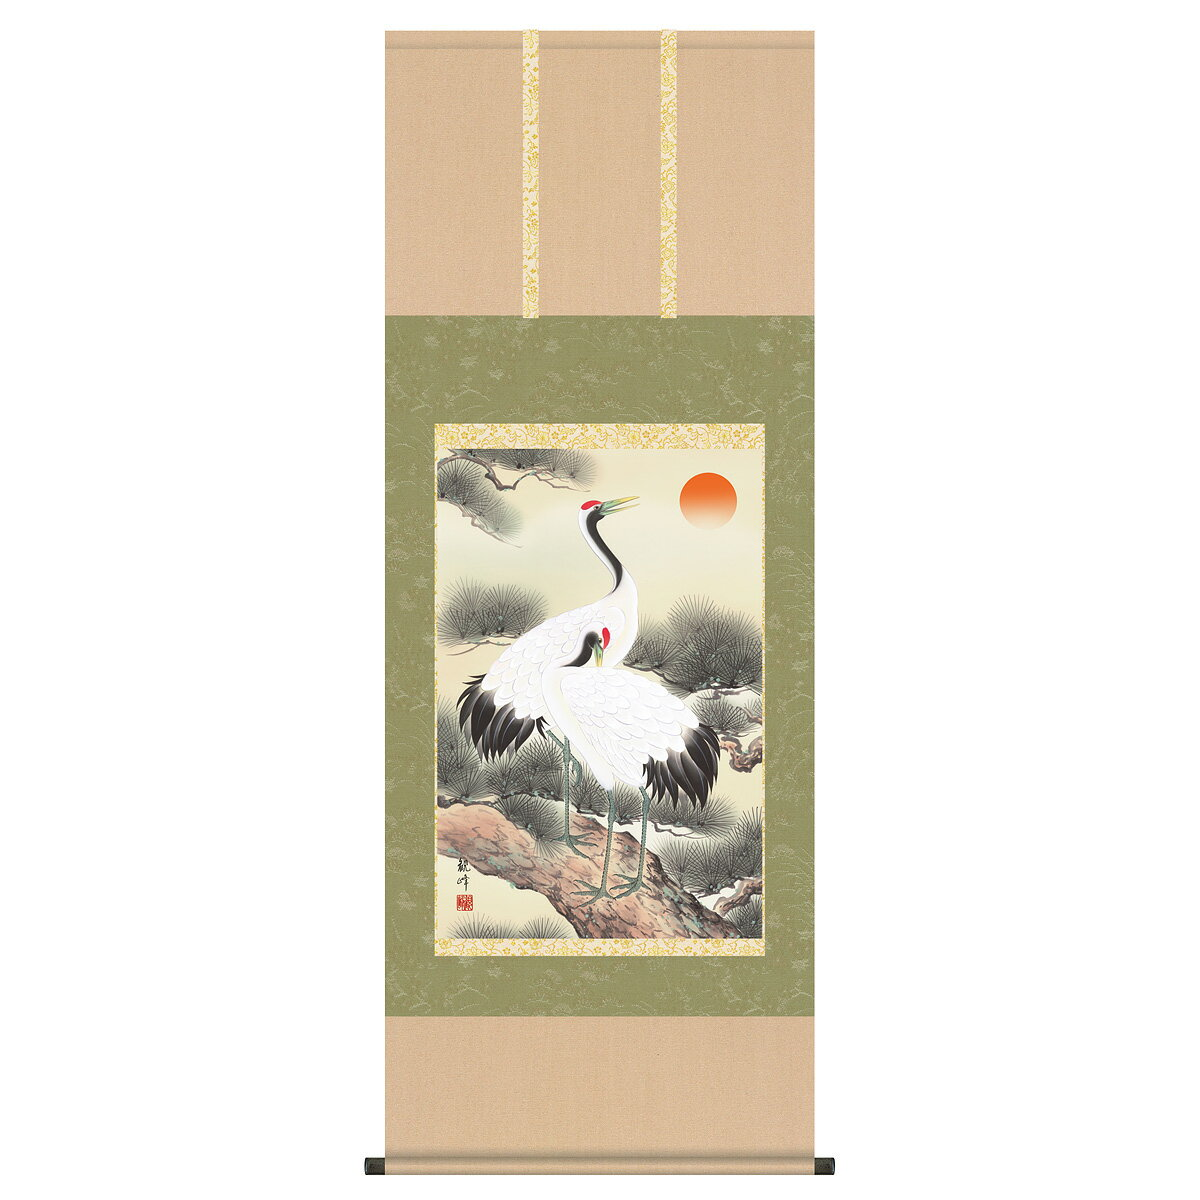 端午の節句 正月 掛け軸 掛軸 「山村観峰(三美会)作 松上双鶴」 ●正月飾り 端午の節句